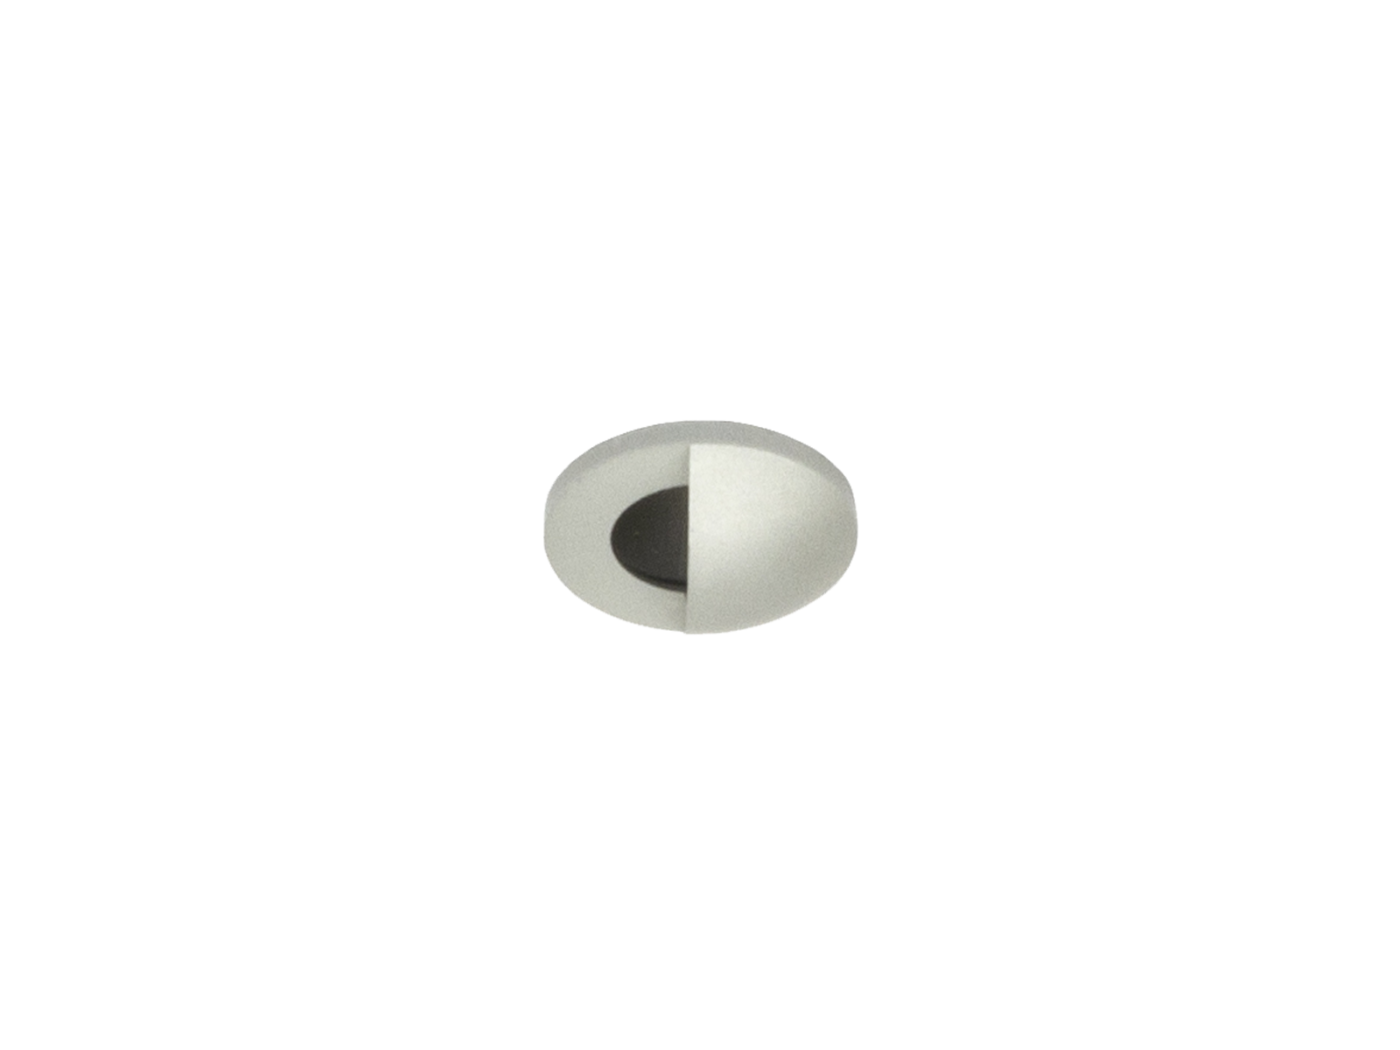 Highline_Sauna_ID_3K_AL_1600x1200